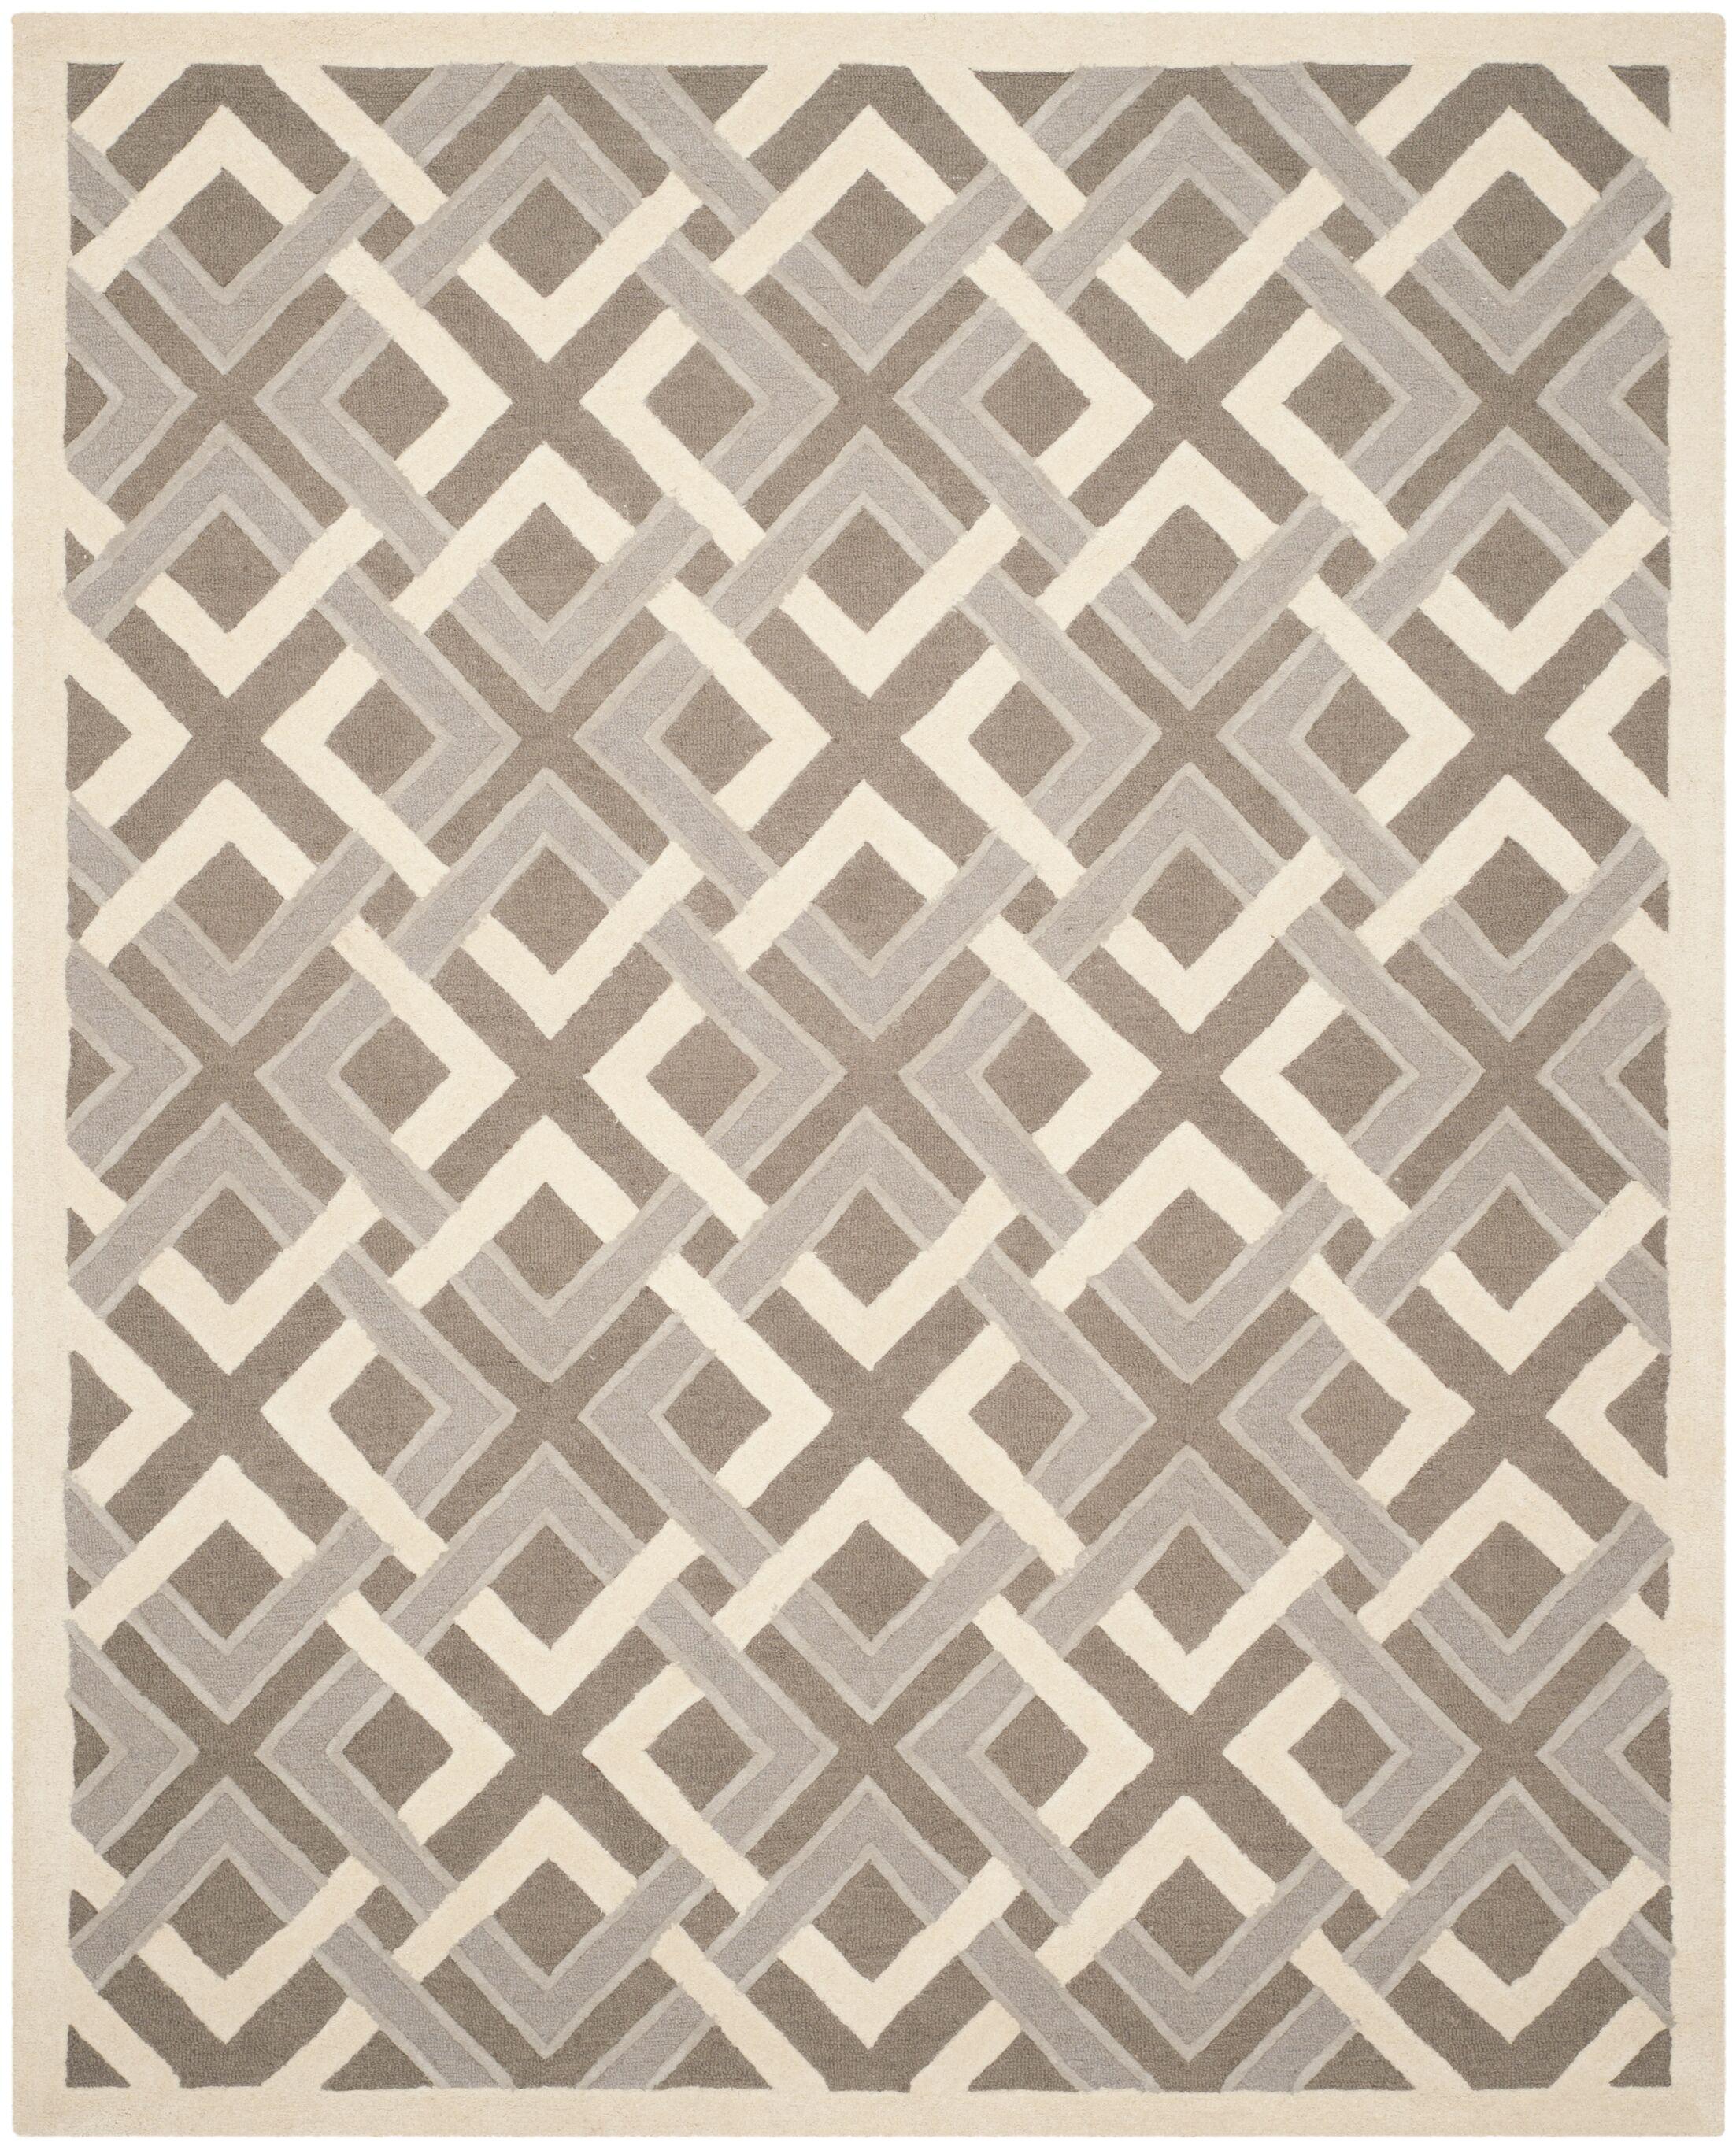 Lattice Hand-Tufted Taupe/Ivory Area Rug Rug Size: Rectangle 8' x 10'